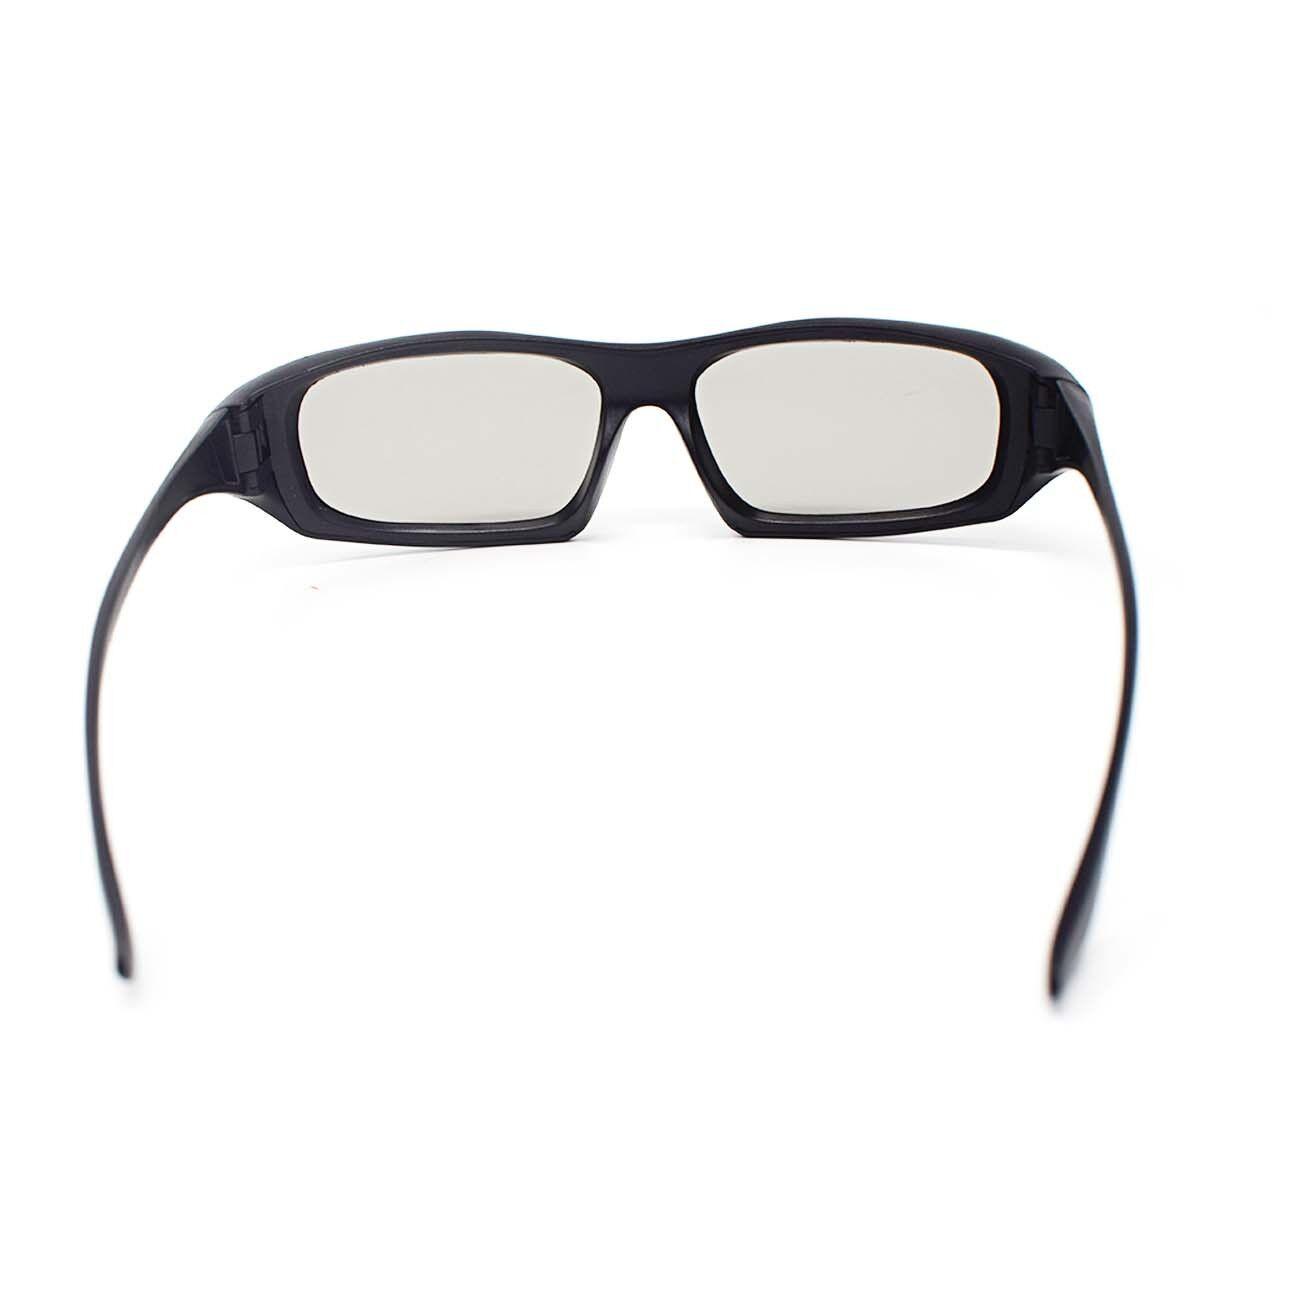 D Active Glasses Phillips Tv